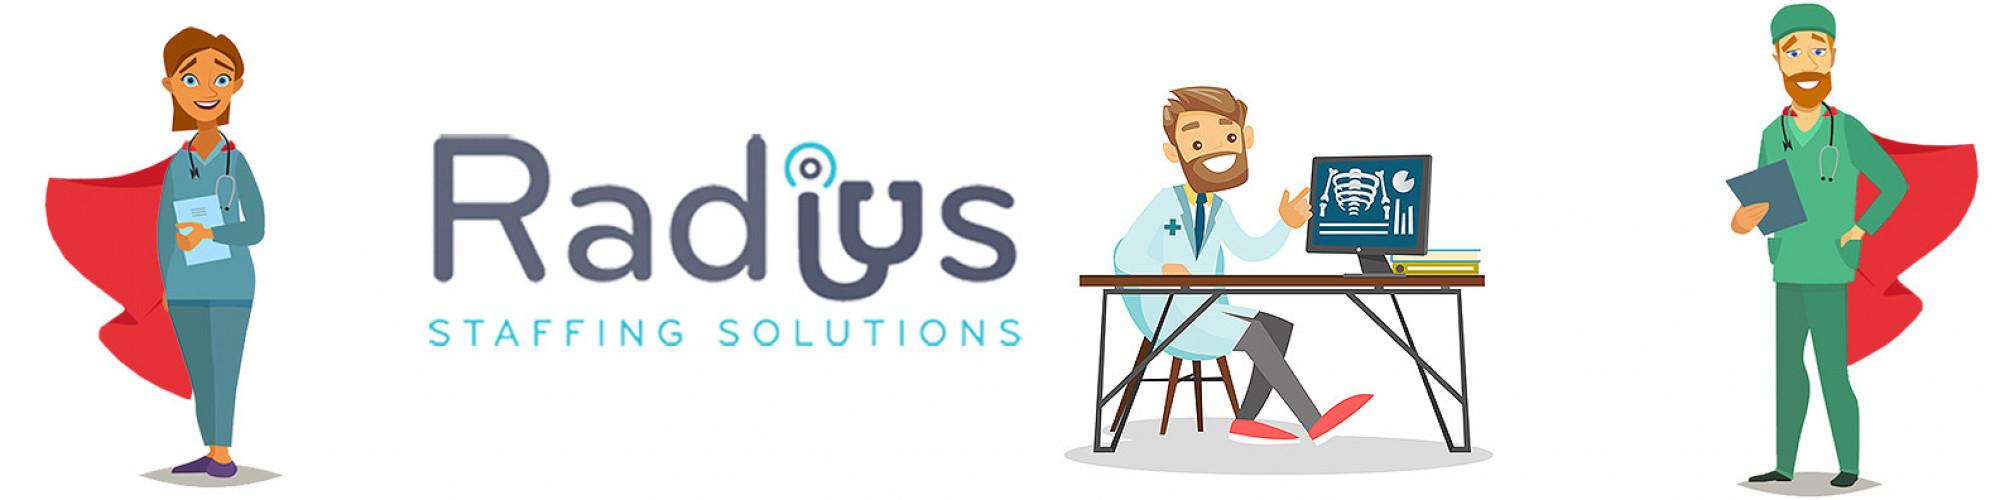 Radius Staffing Solutions